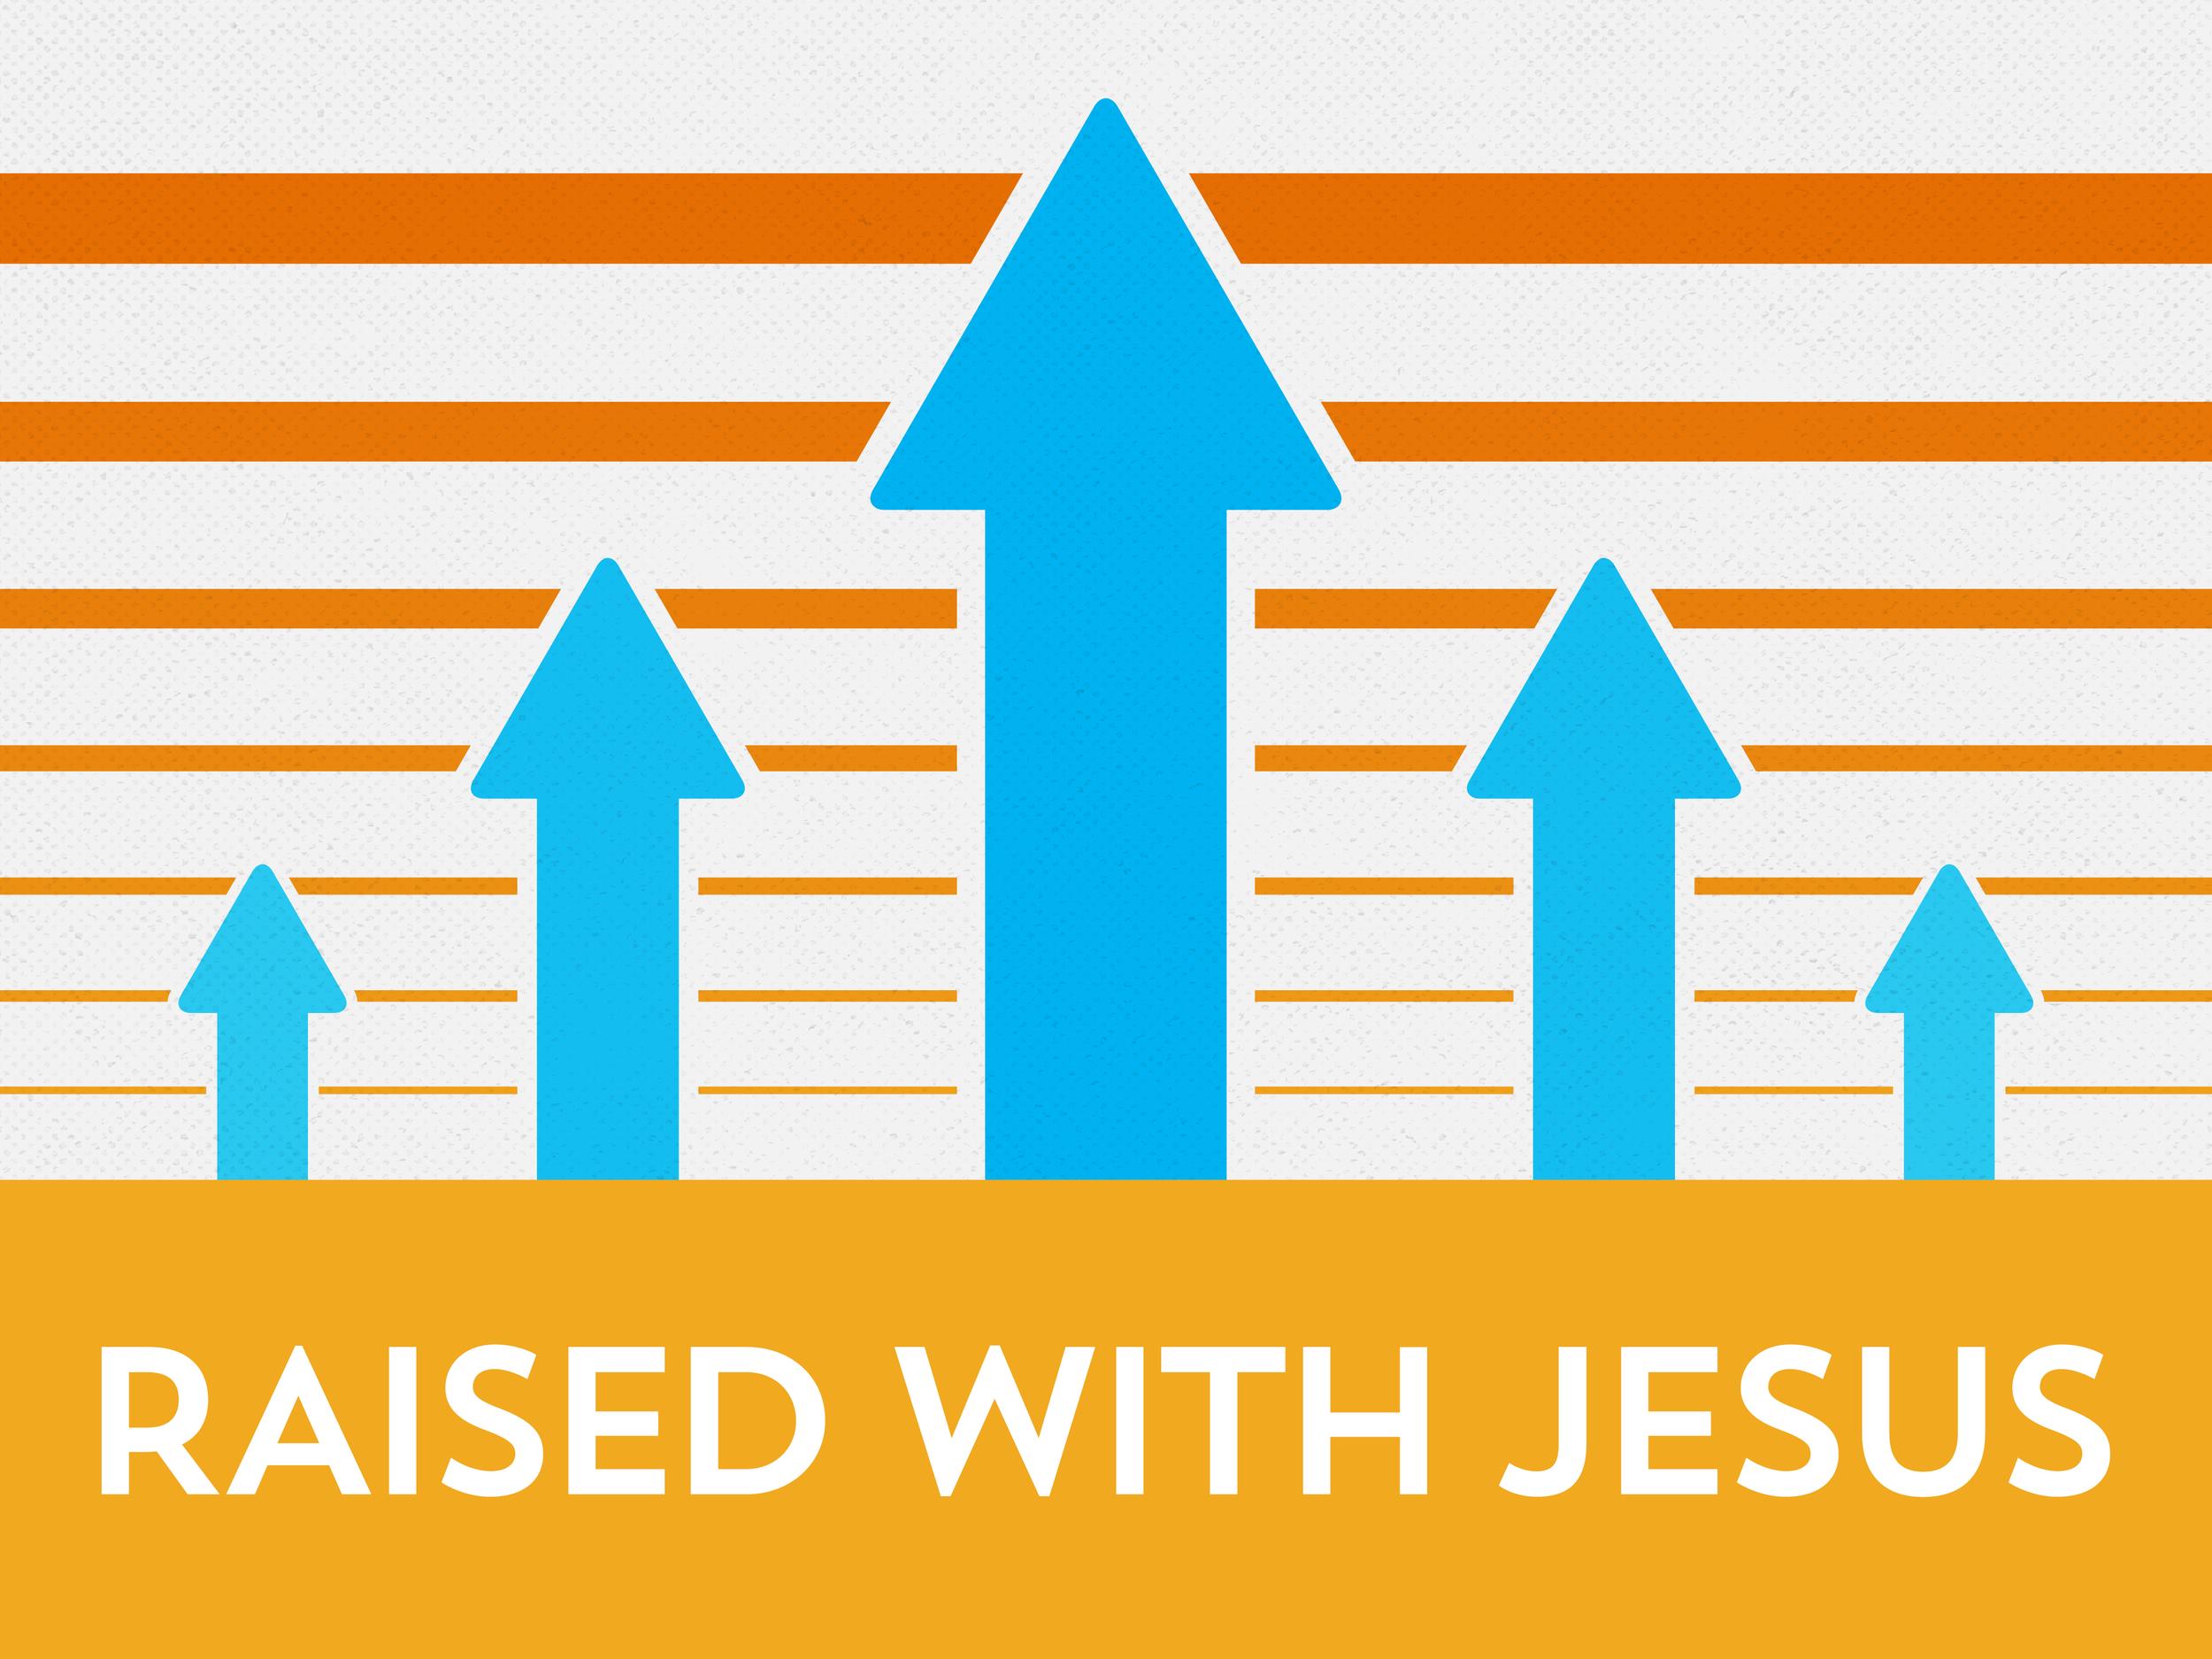 Raised With Jesus